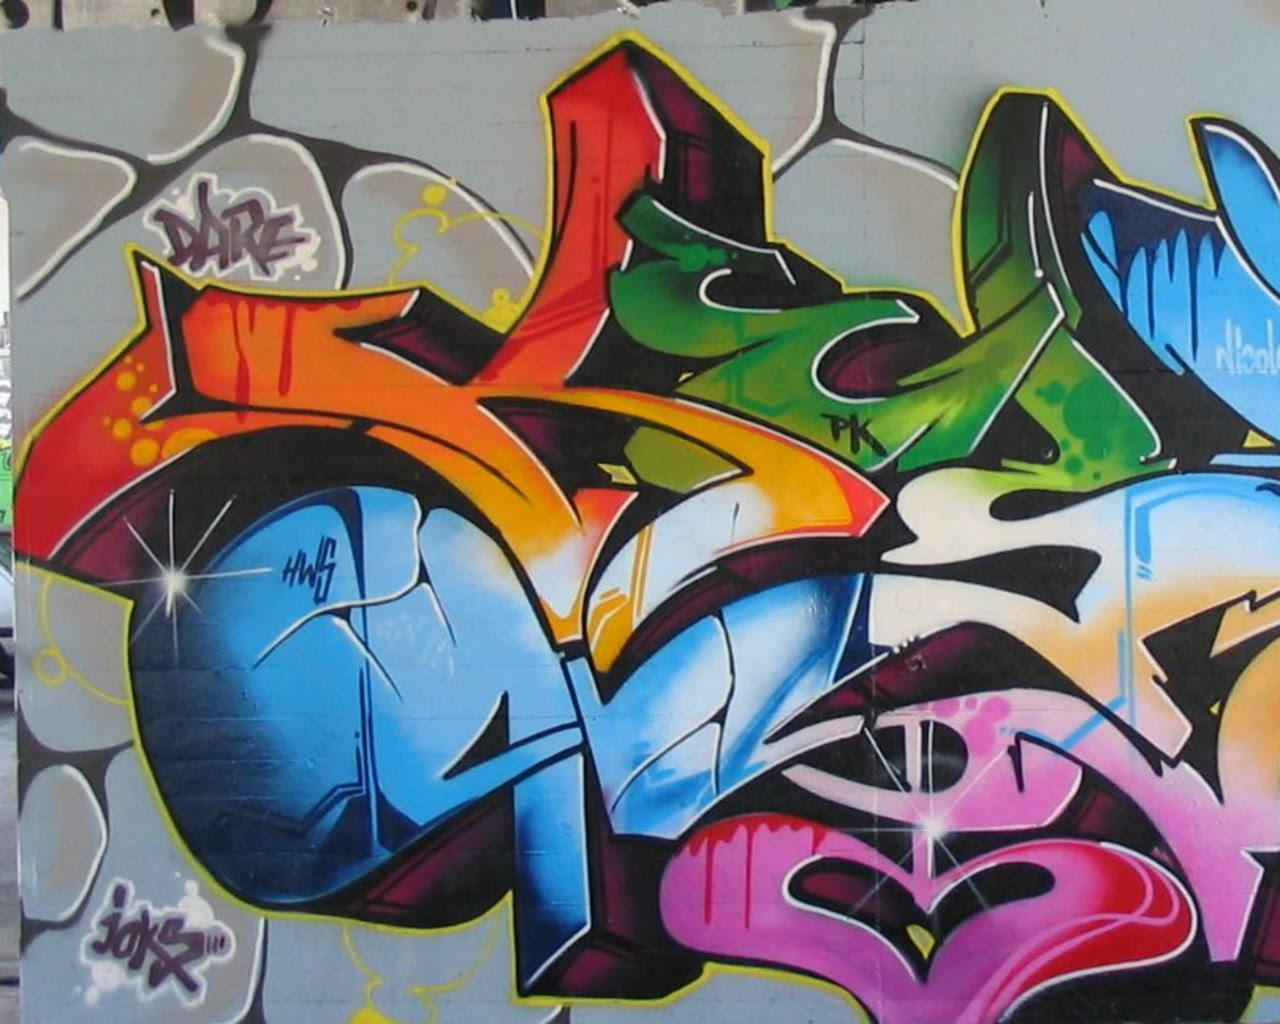 Graffiti Wallpaper Hd Wallpapers Widescreen Wallpapers